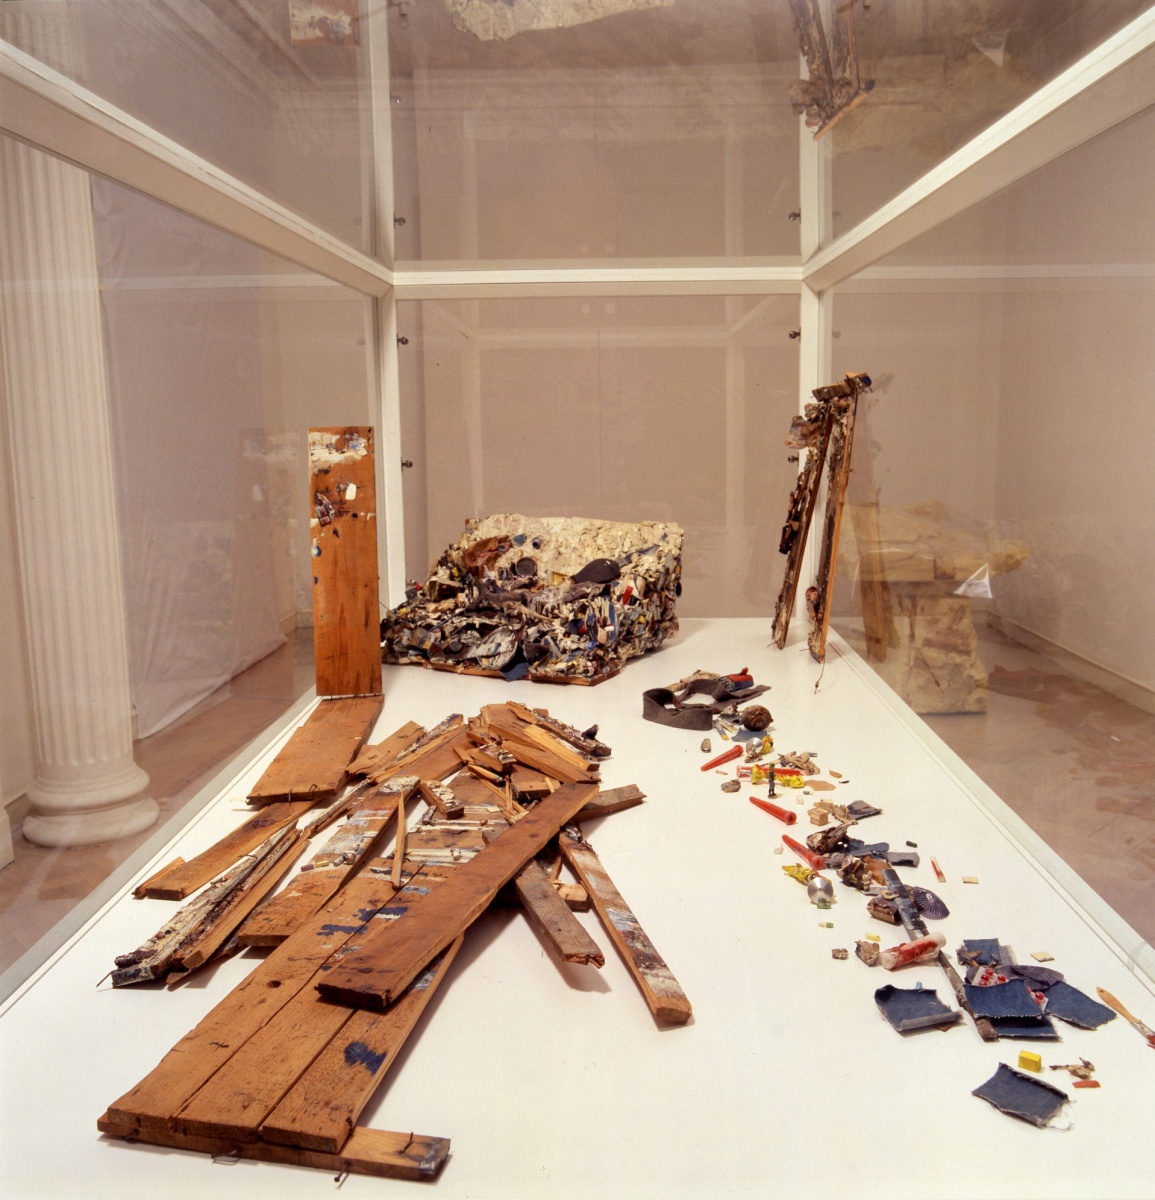 Joseph Beuys, Hasengrab